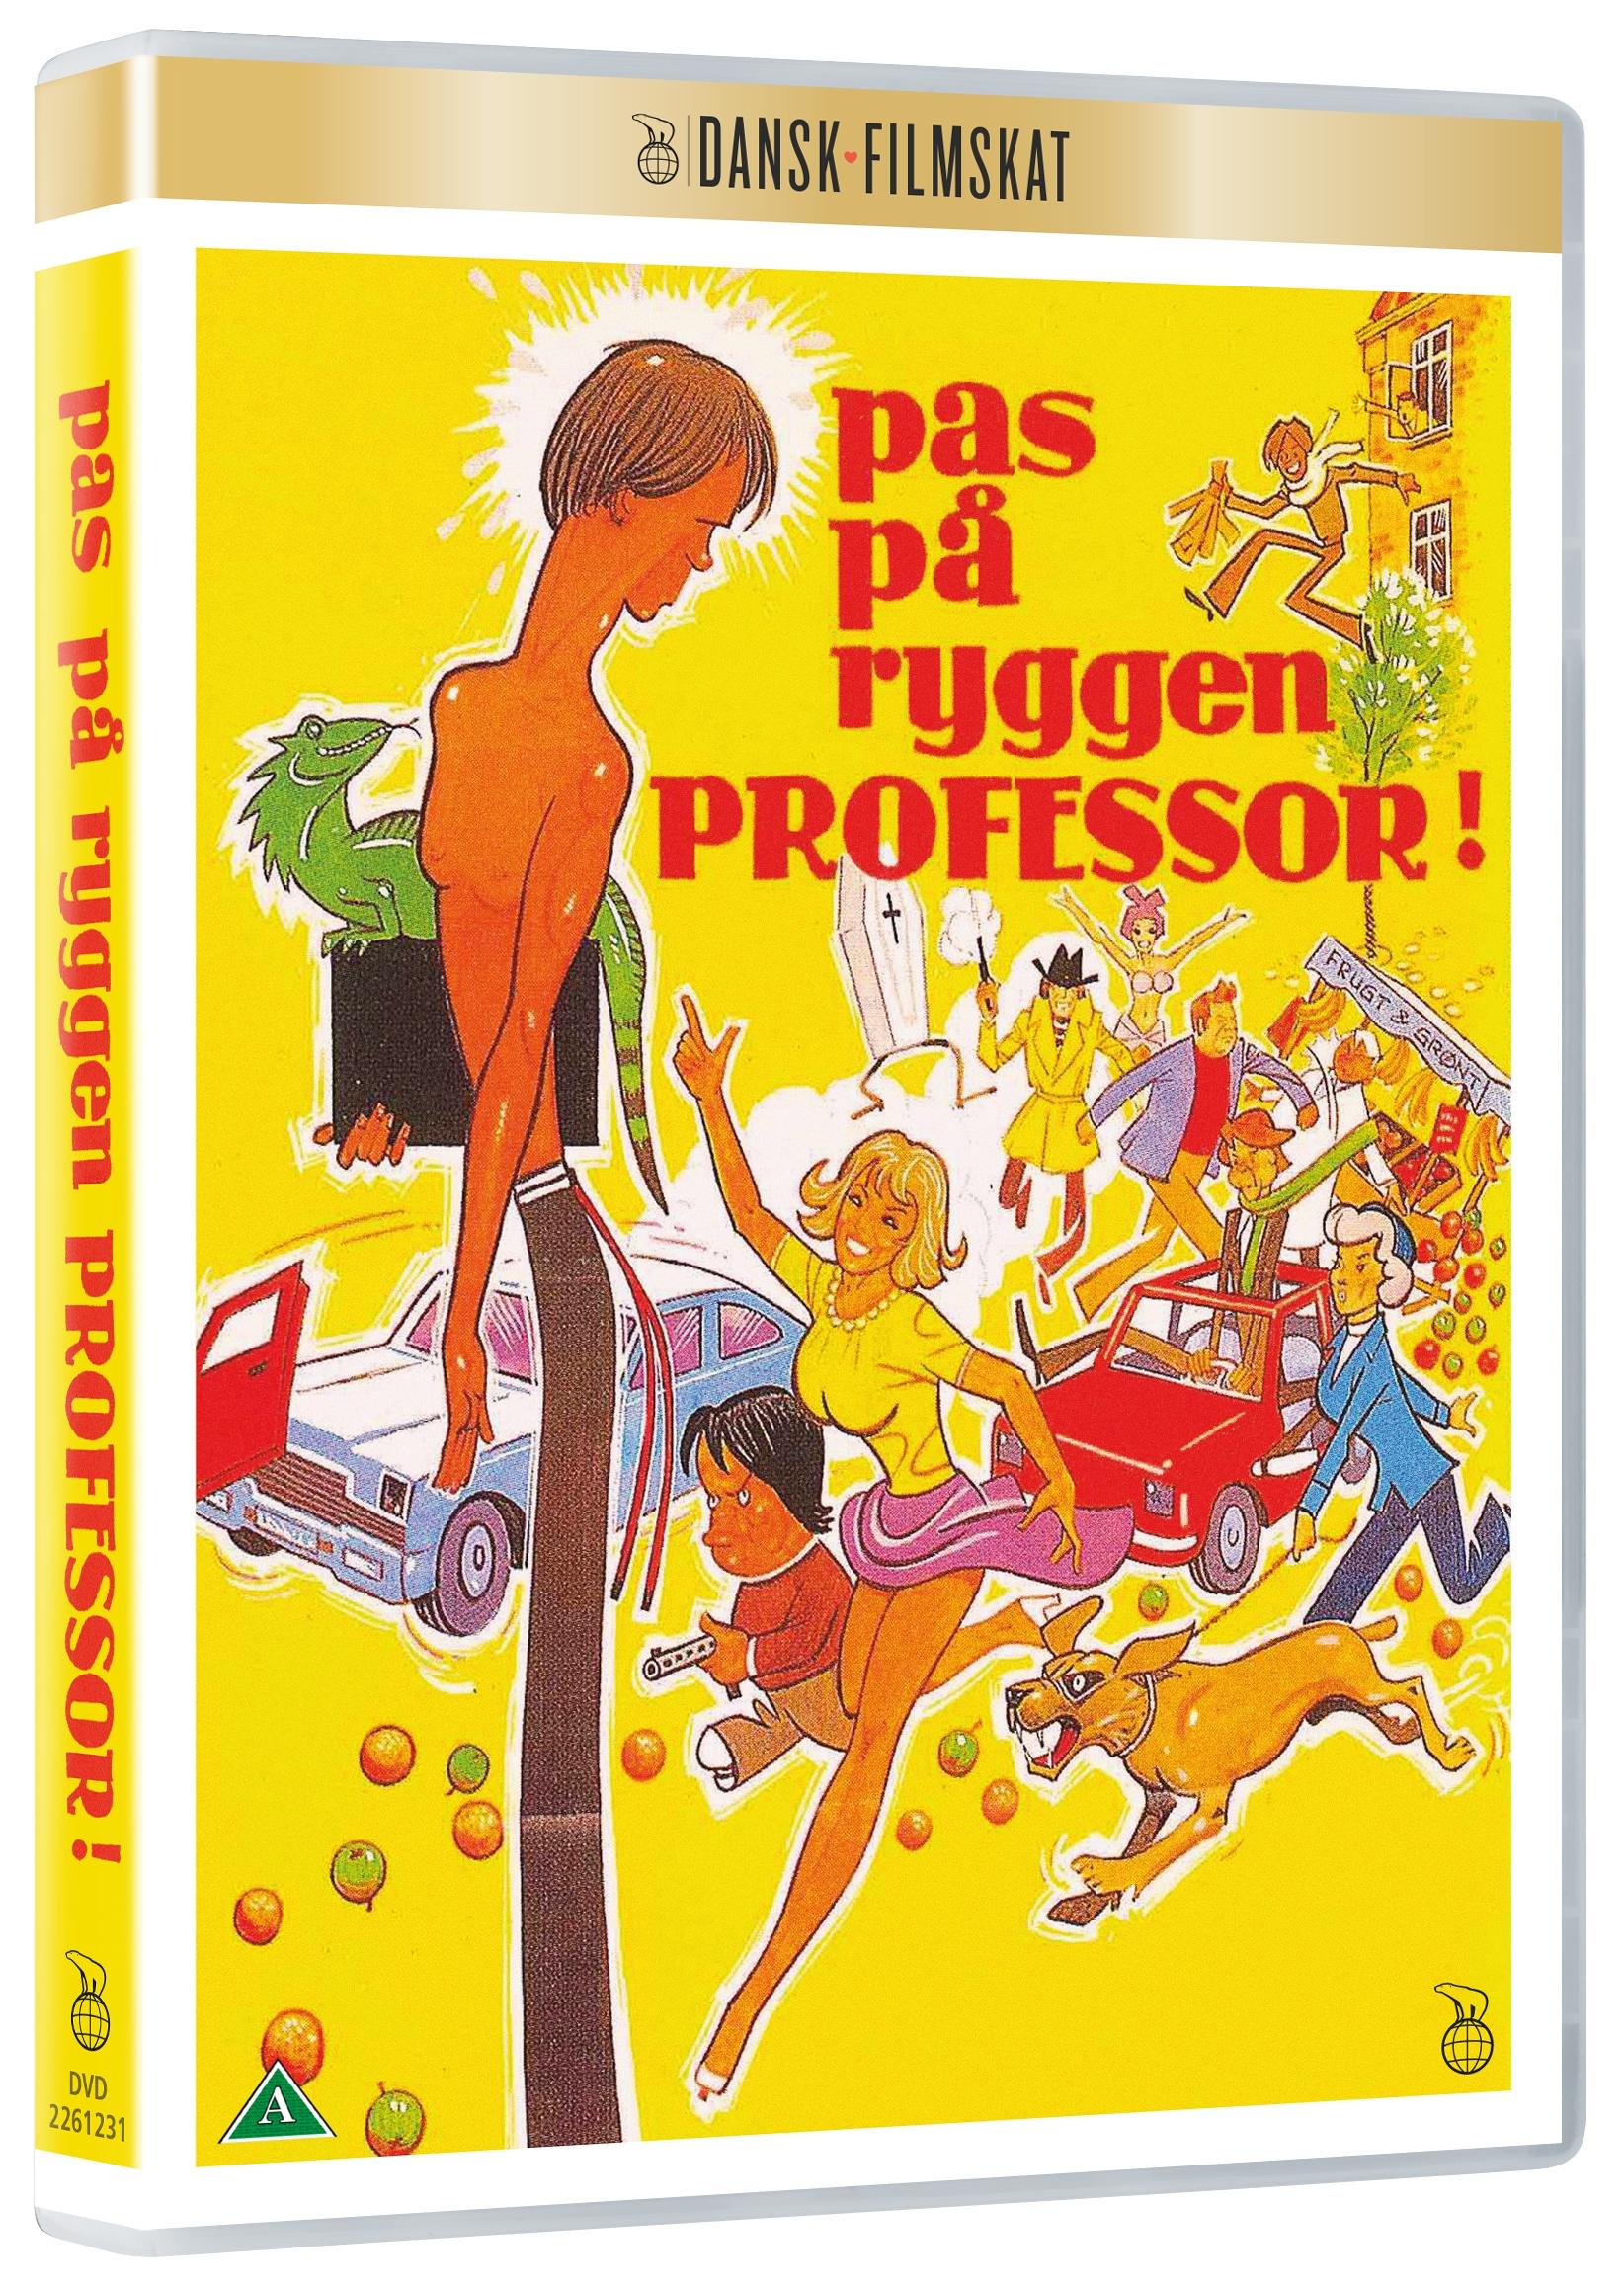 Pas På Ryggen Professor -  - Film -  - 5708758704618 - 15/5-2020